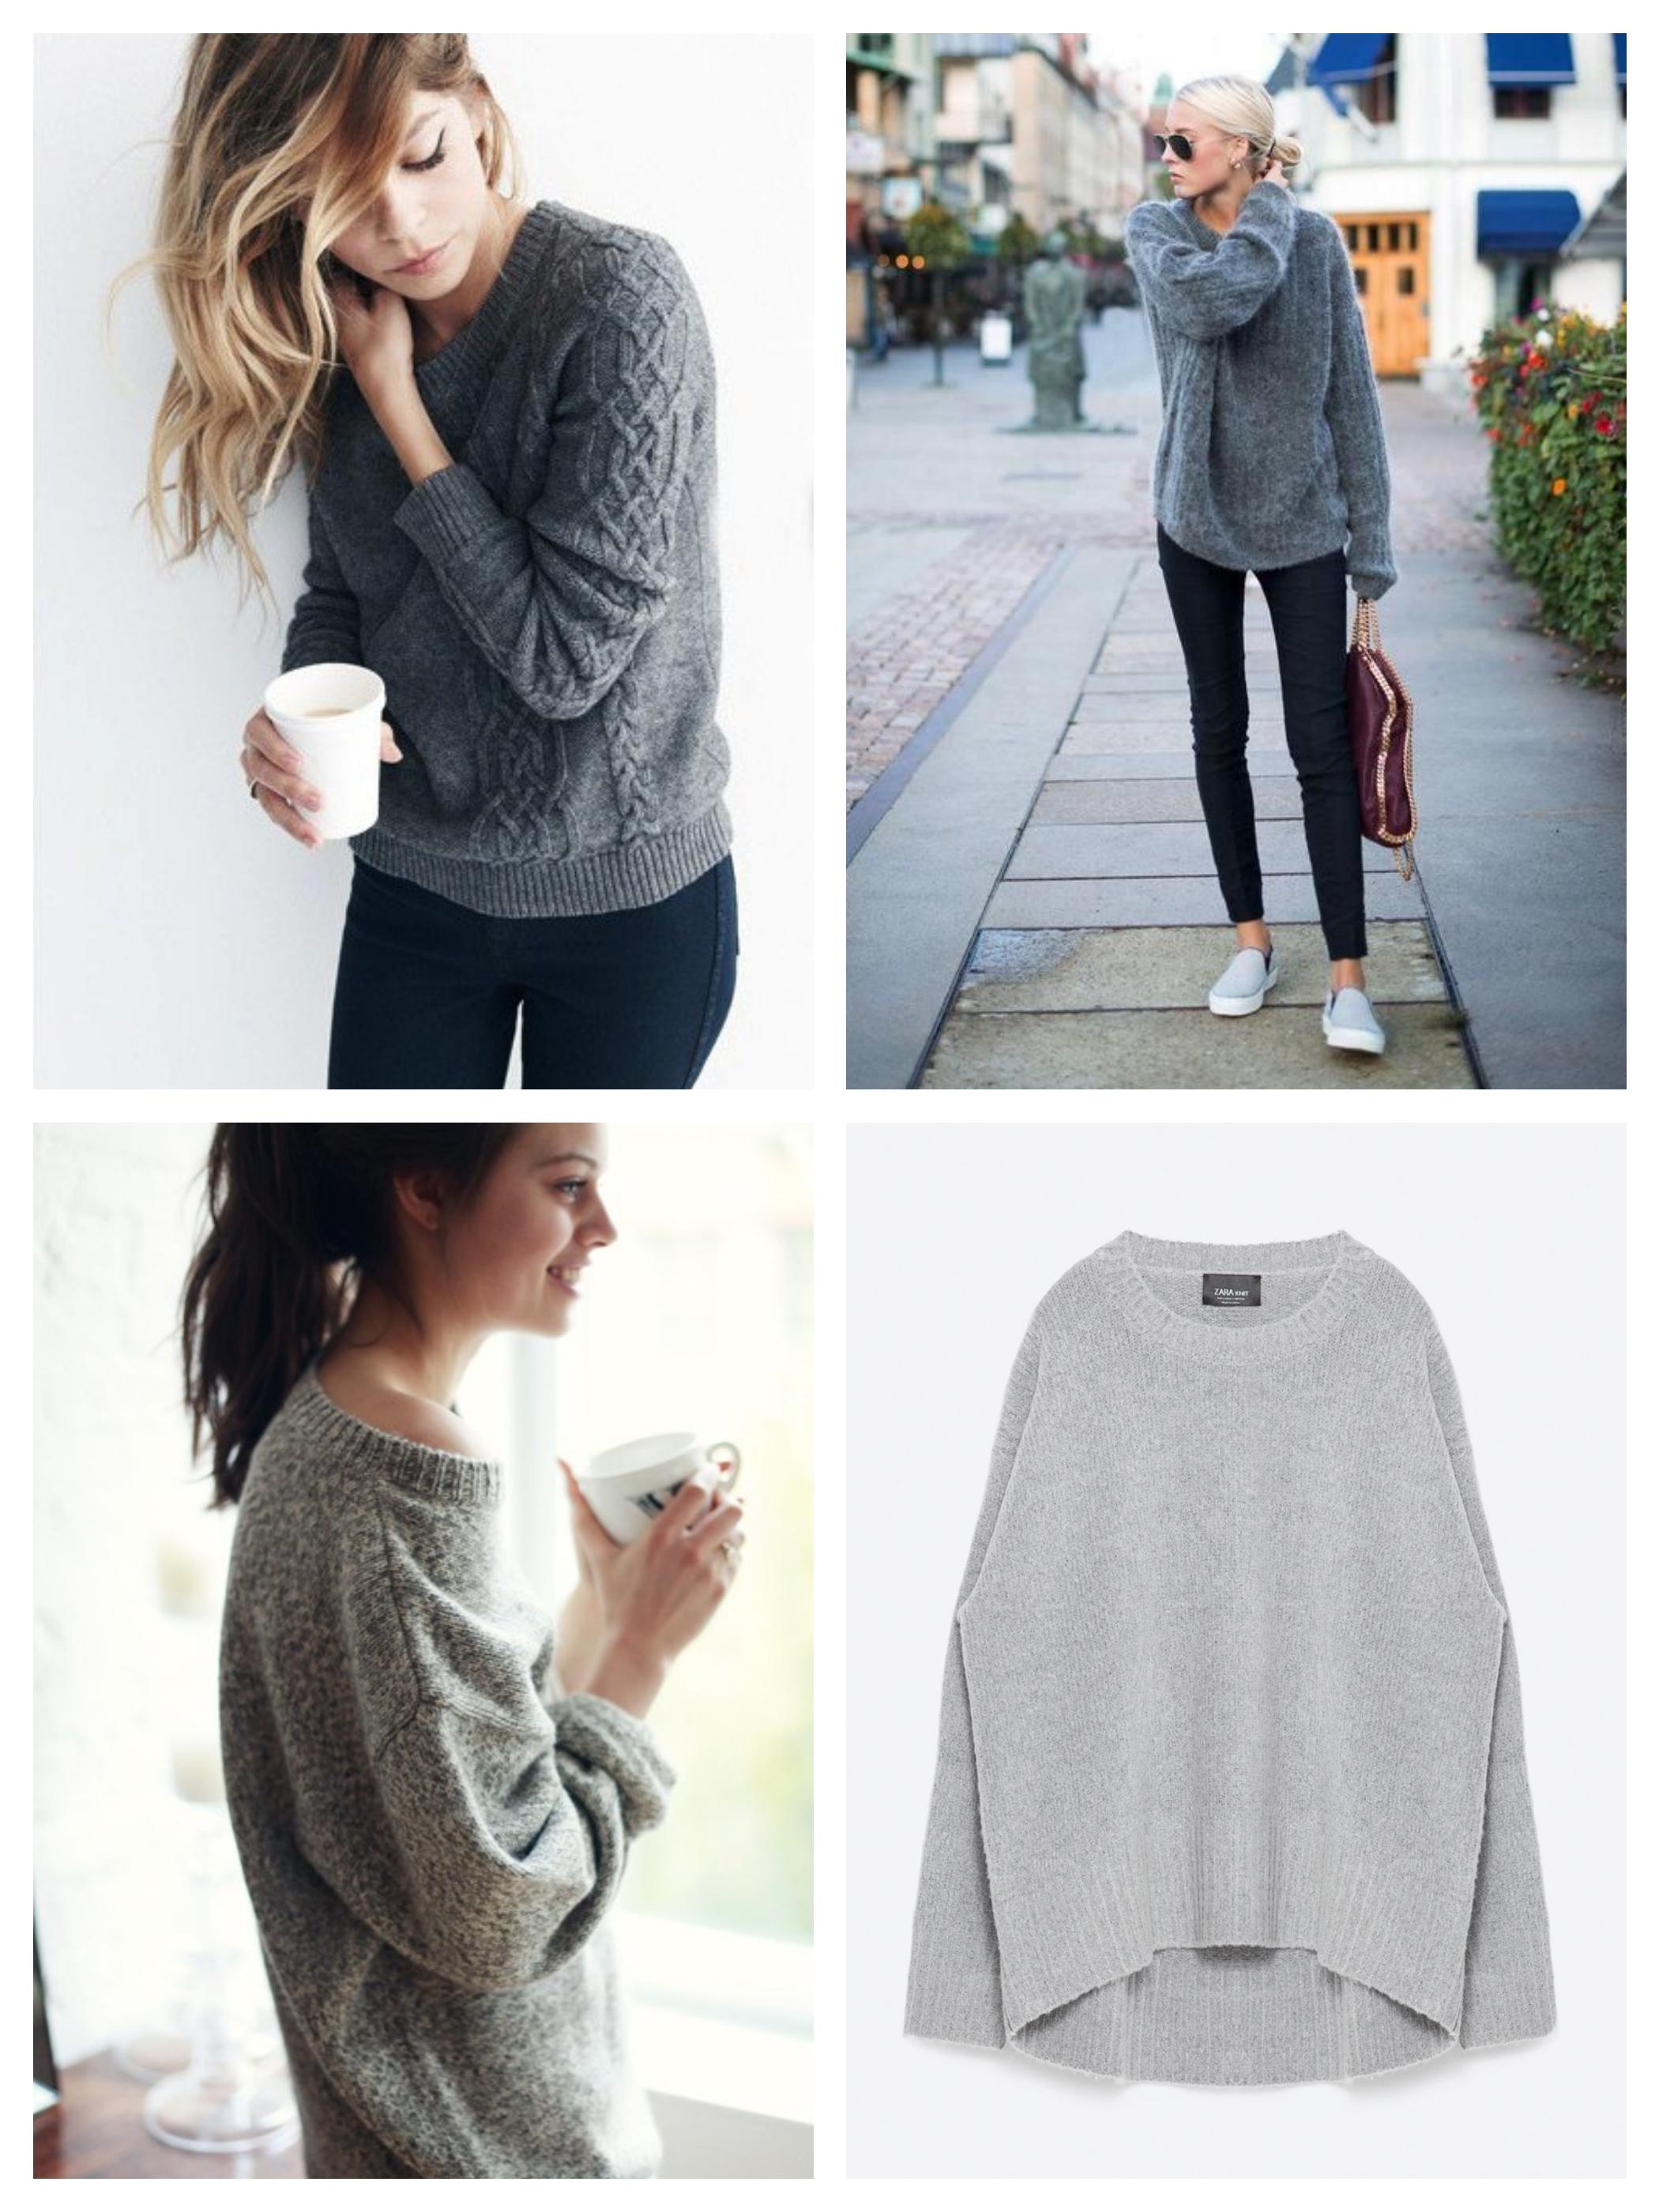 oversized sweaterZara_Fotor_Collage